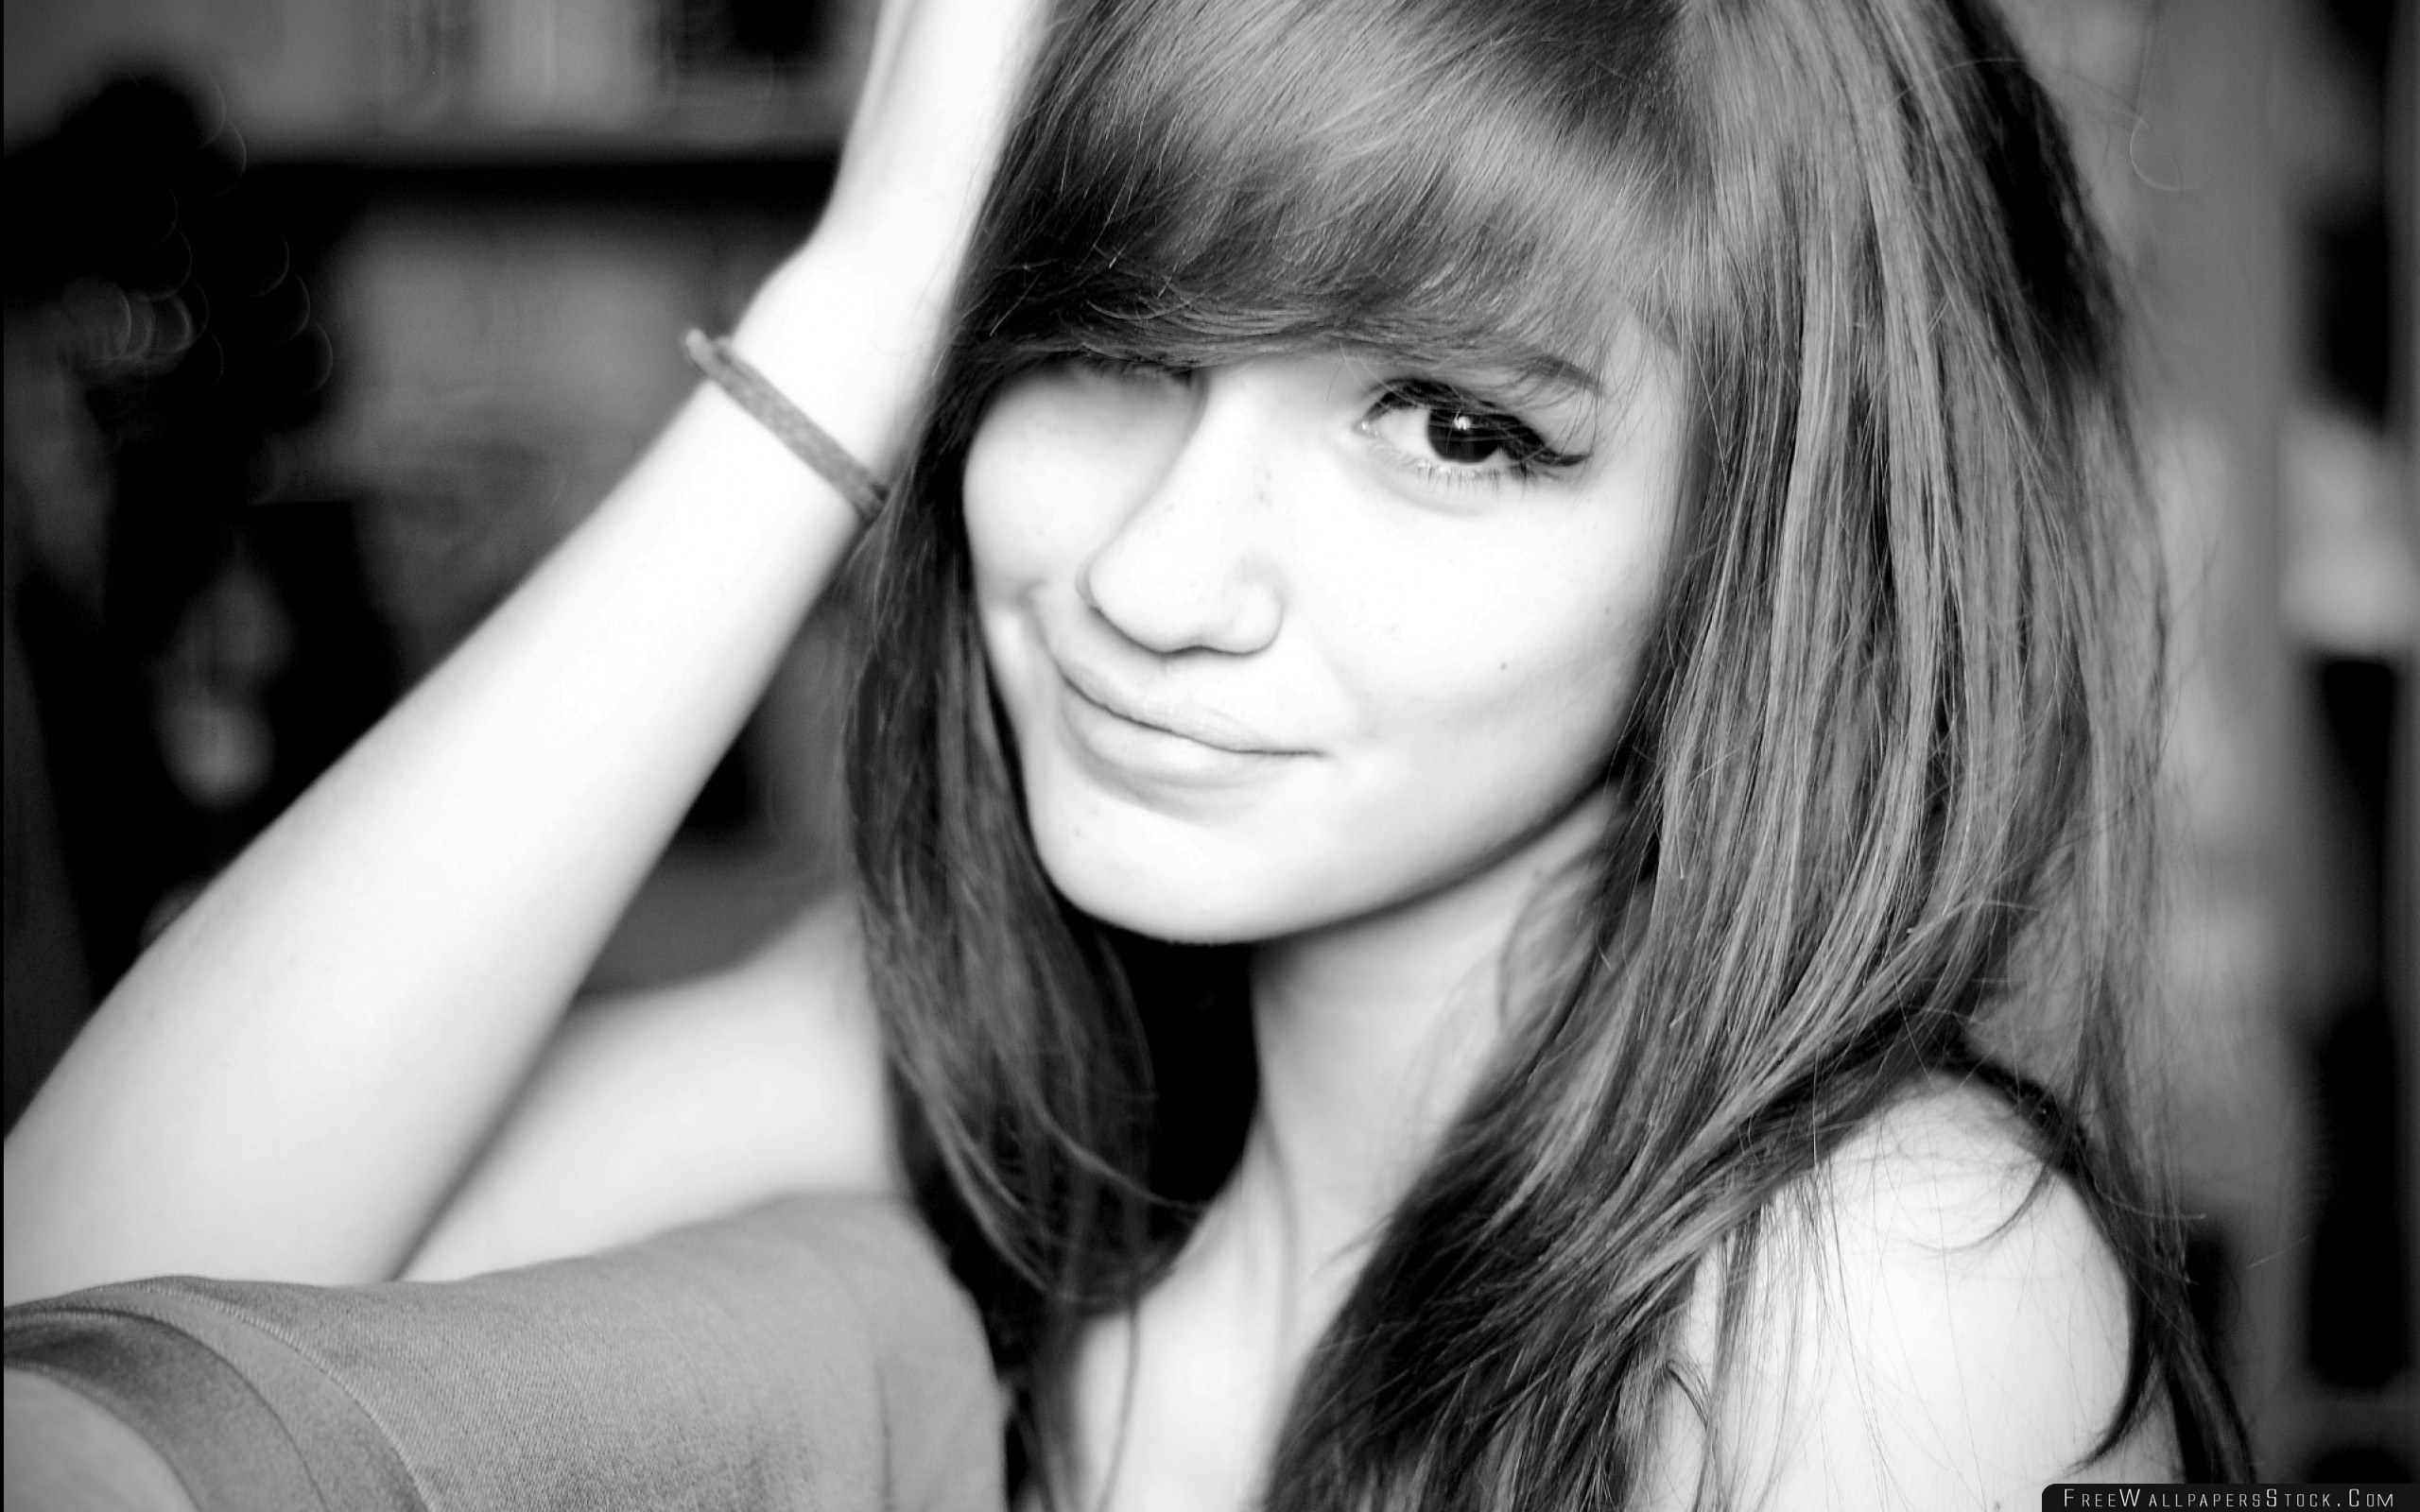 Download Free Wallpaper Brunette Look Smile   Face